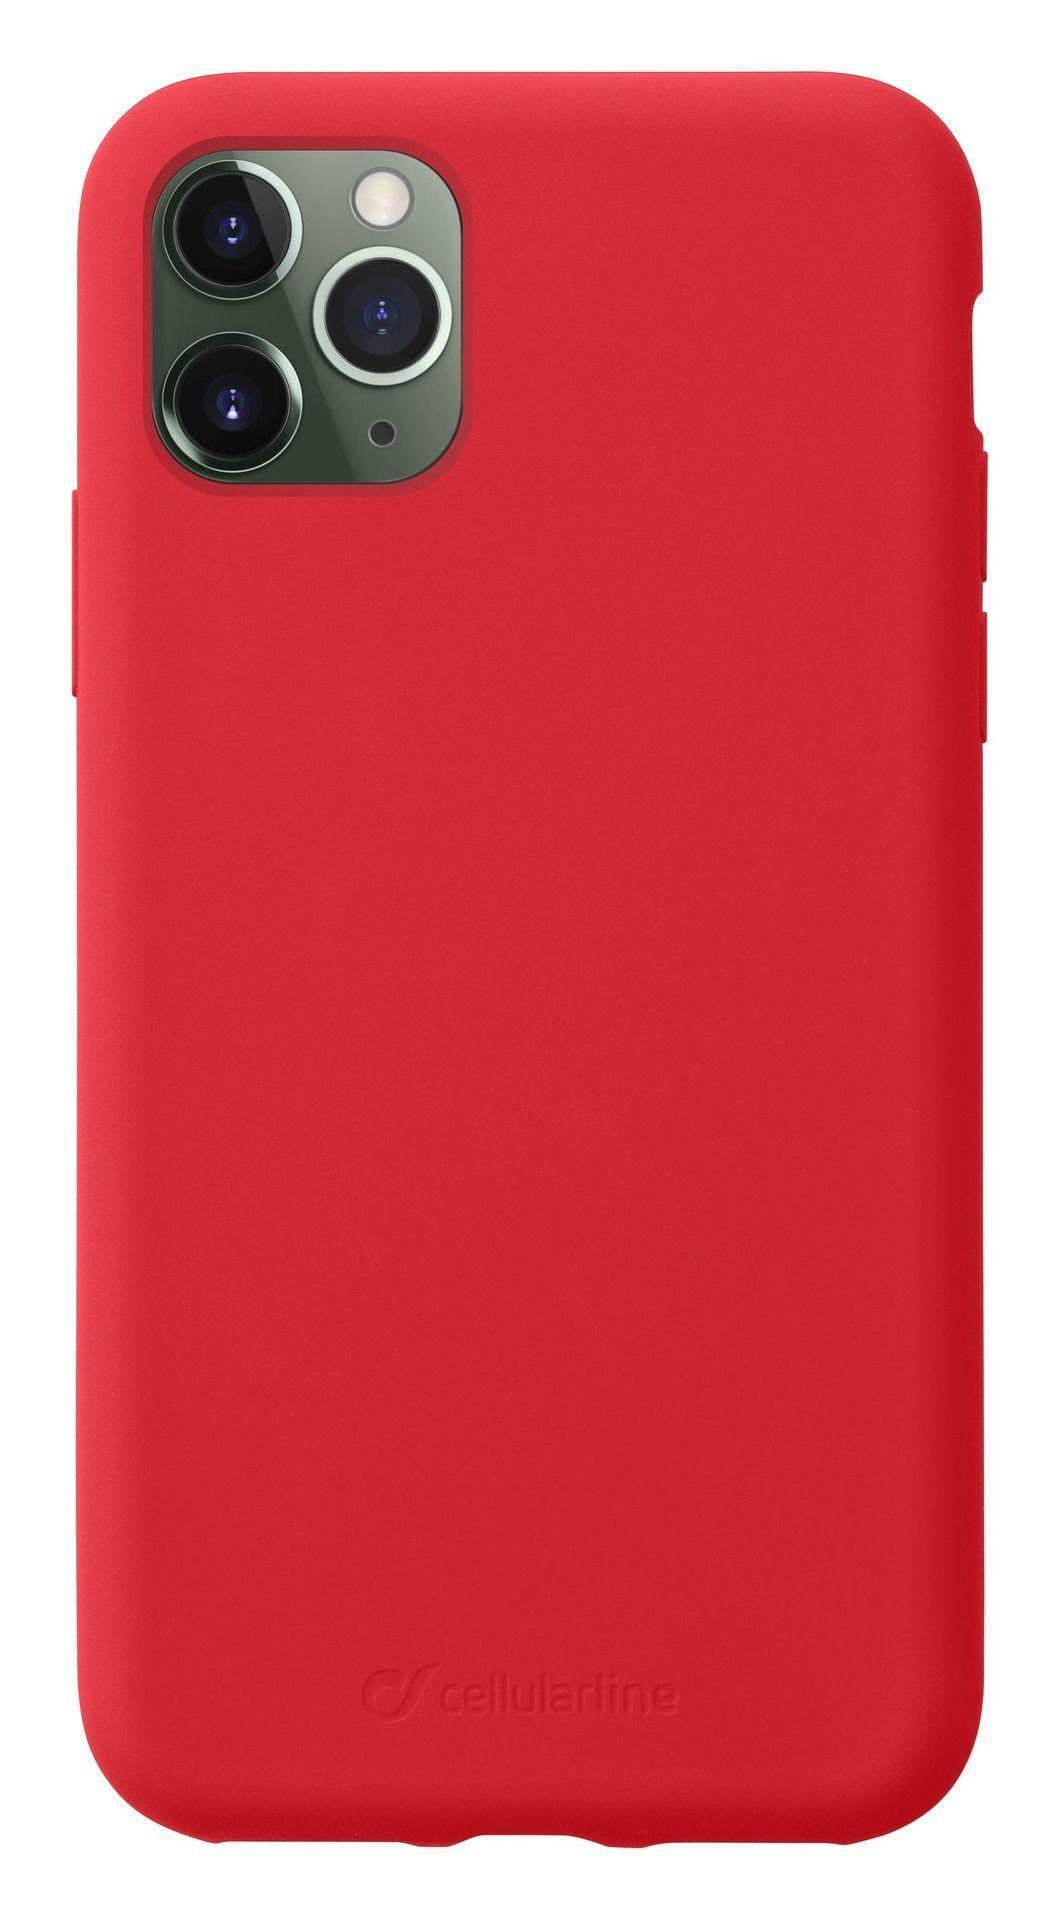 Калъф за iPhone 11 Pro Max Cellularline - Sensation, червен - 1